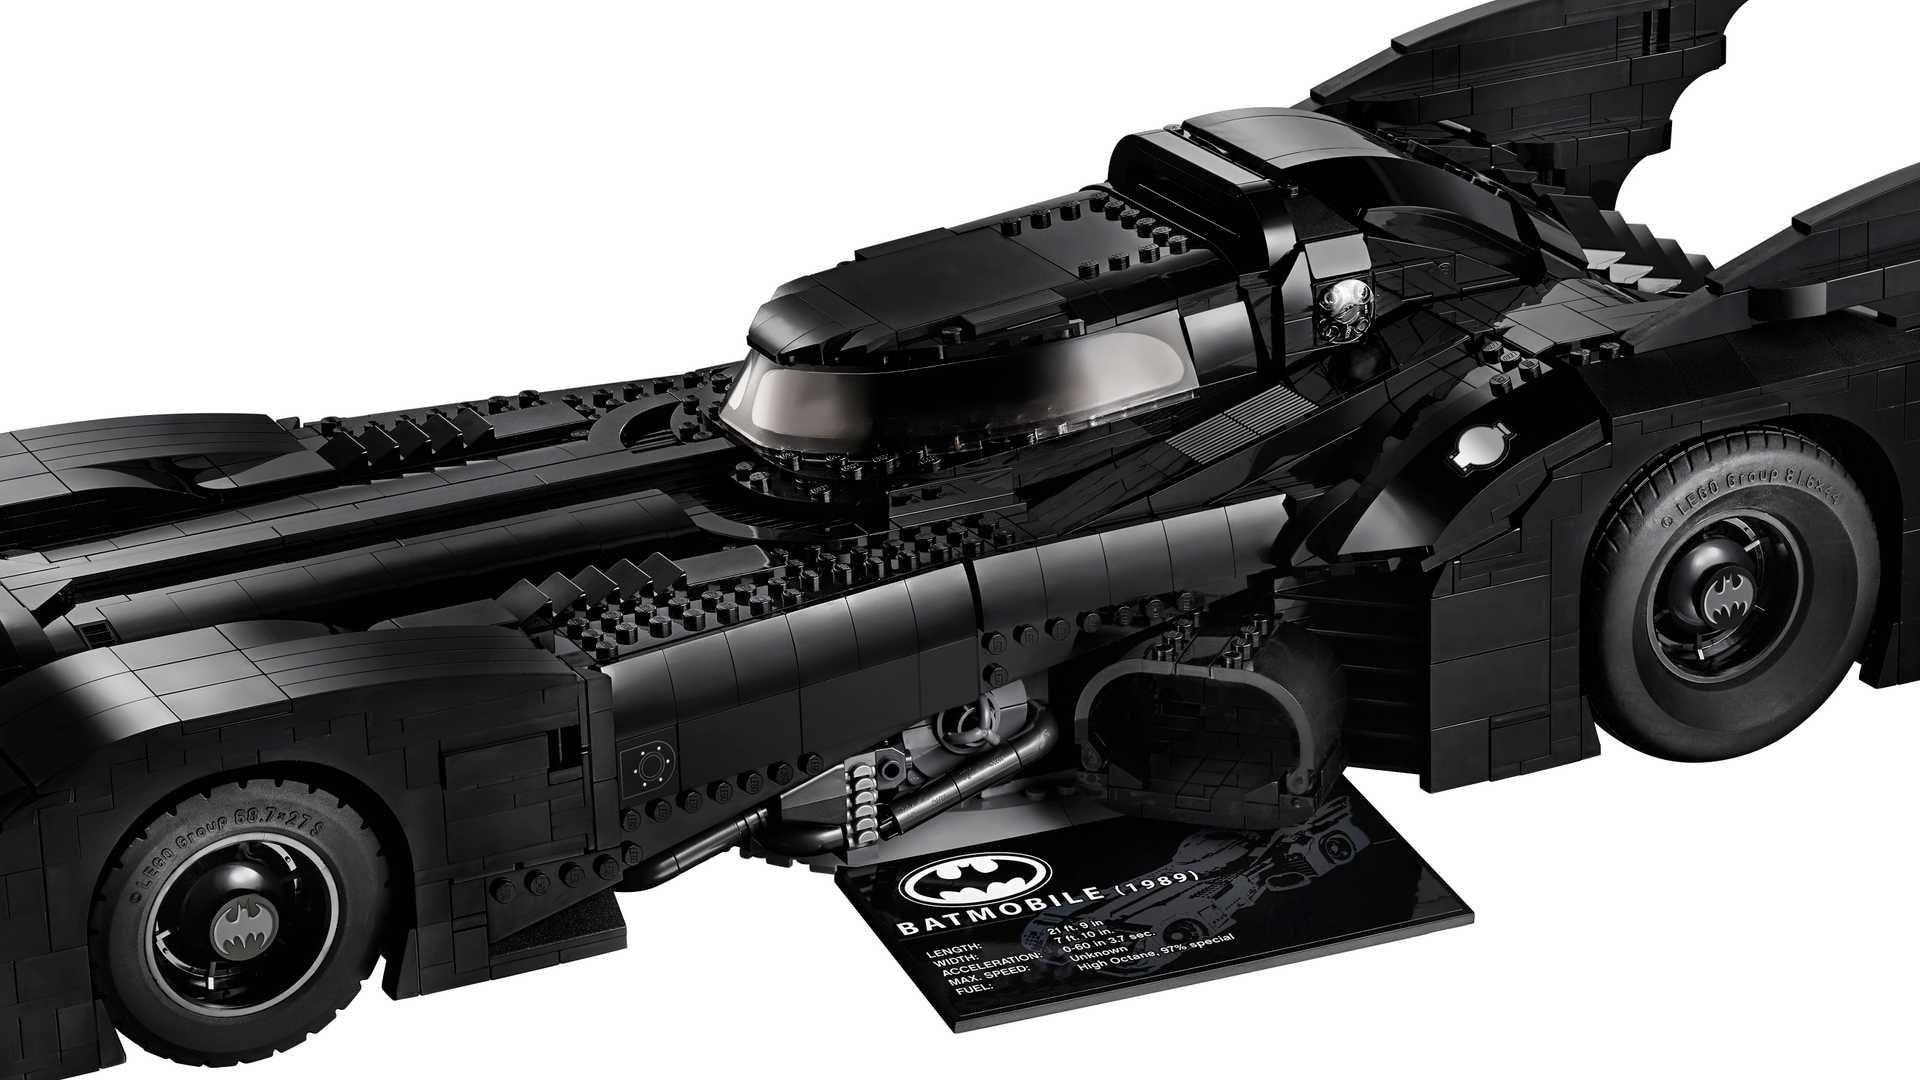 Lego-Batmobile-kit-1989-9